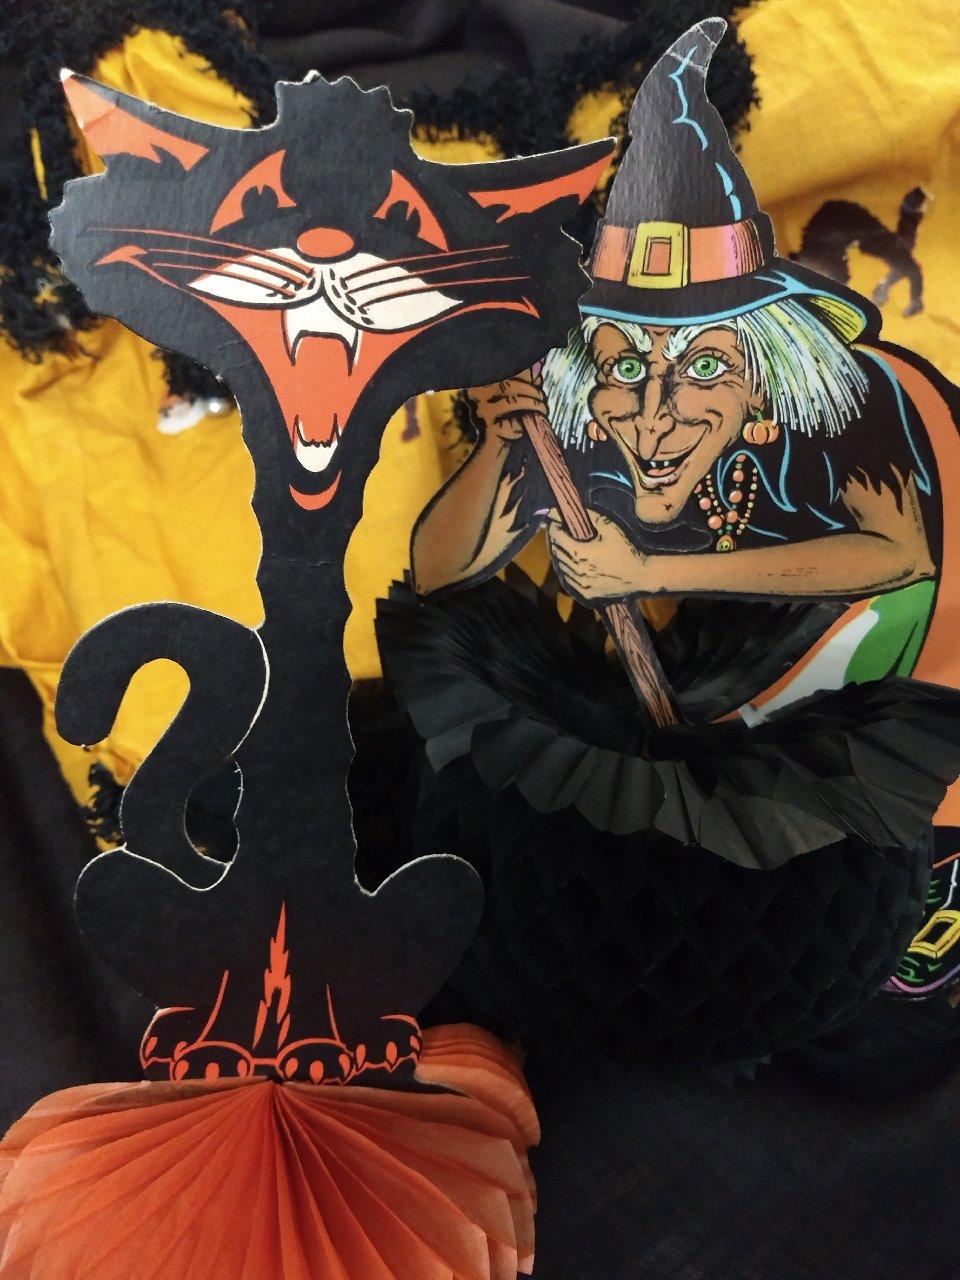 Sneak Preview Spooky Vintage Halloween Costume Wicked